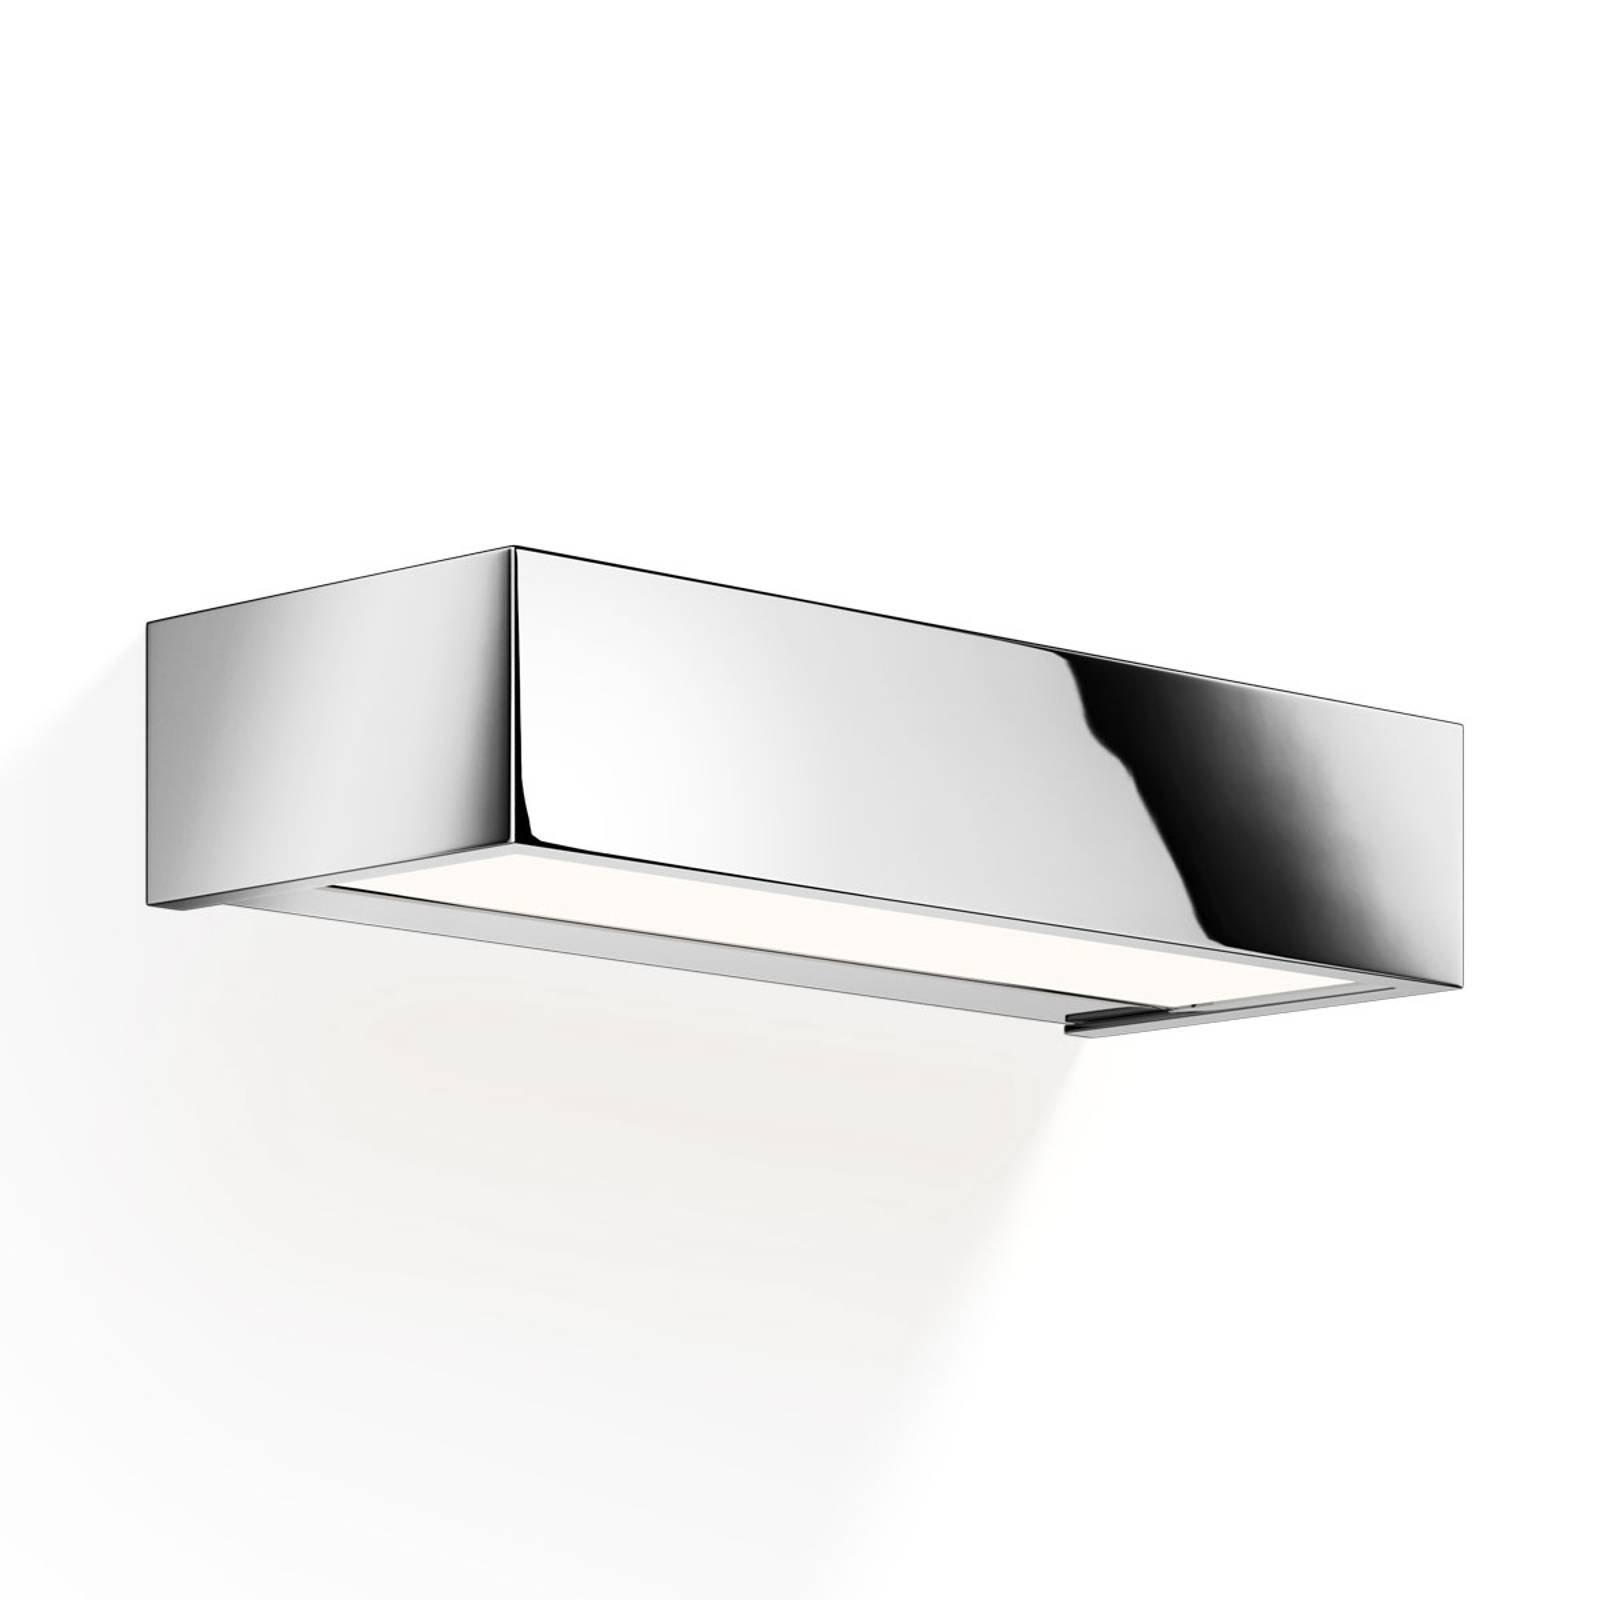 Decor Walther Box 25 N LED-vegglampe 3 000 K